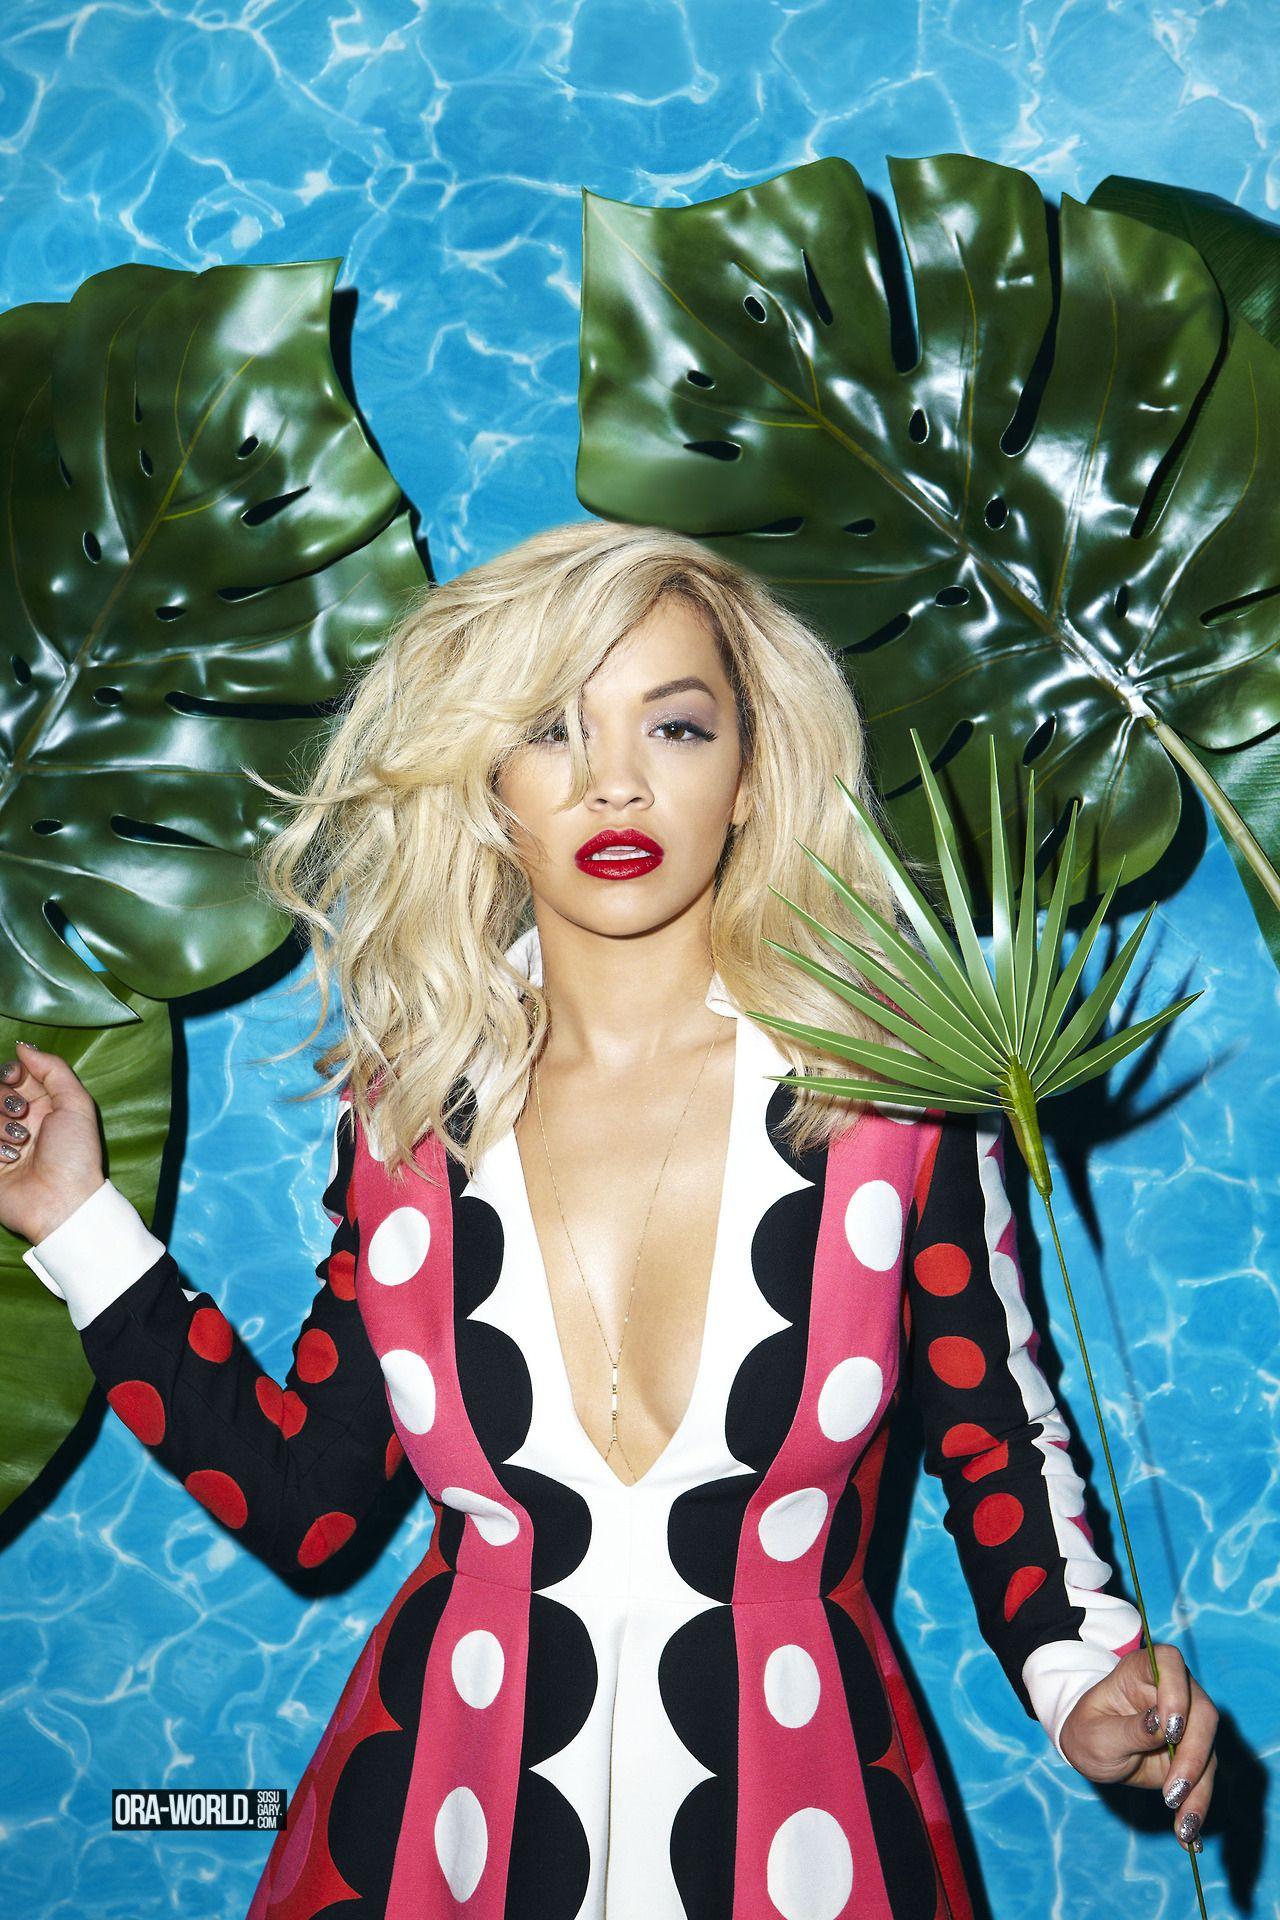 Photoshoot For Vogue Magazine November 2015: Rita Ora Photoshoot For Modzik Magazine